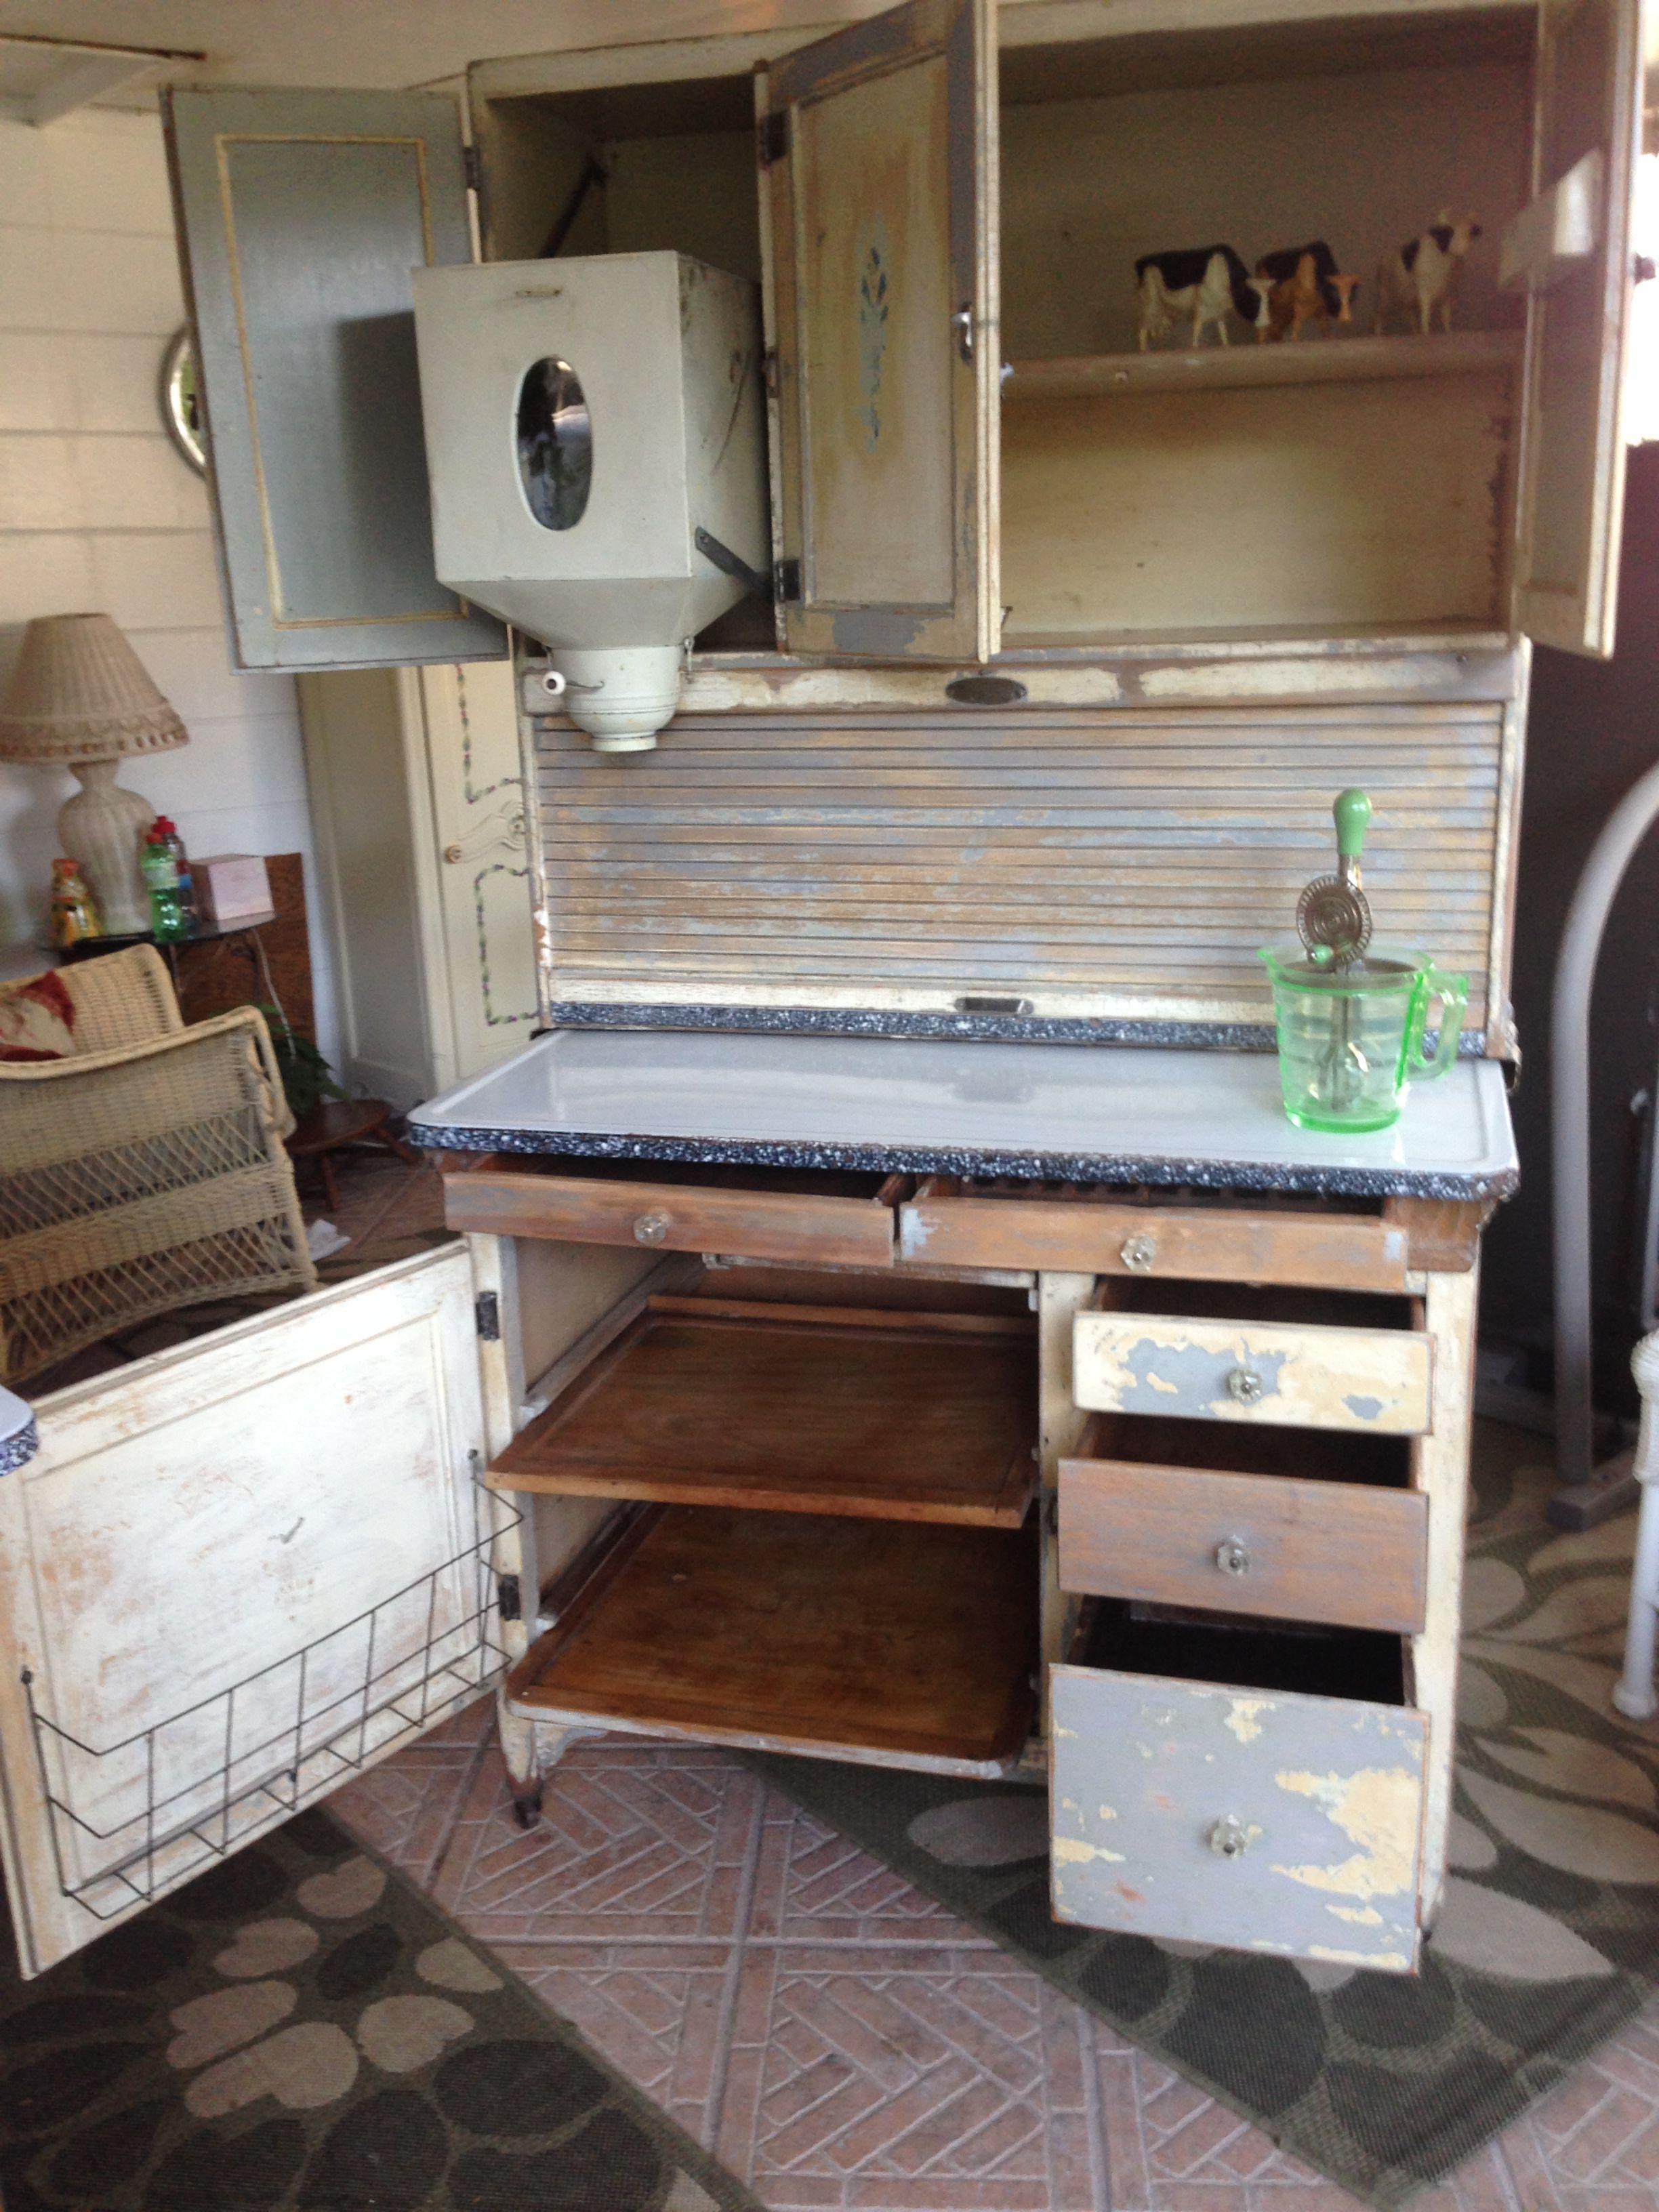 1920 S Sellers Brand Hoosier Style Kitchen Cabinet Original